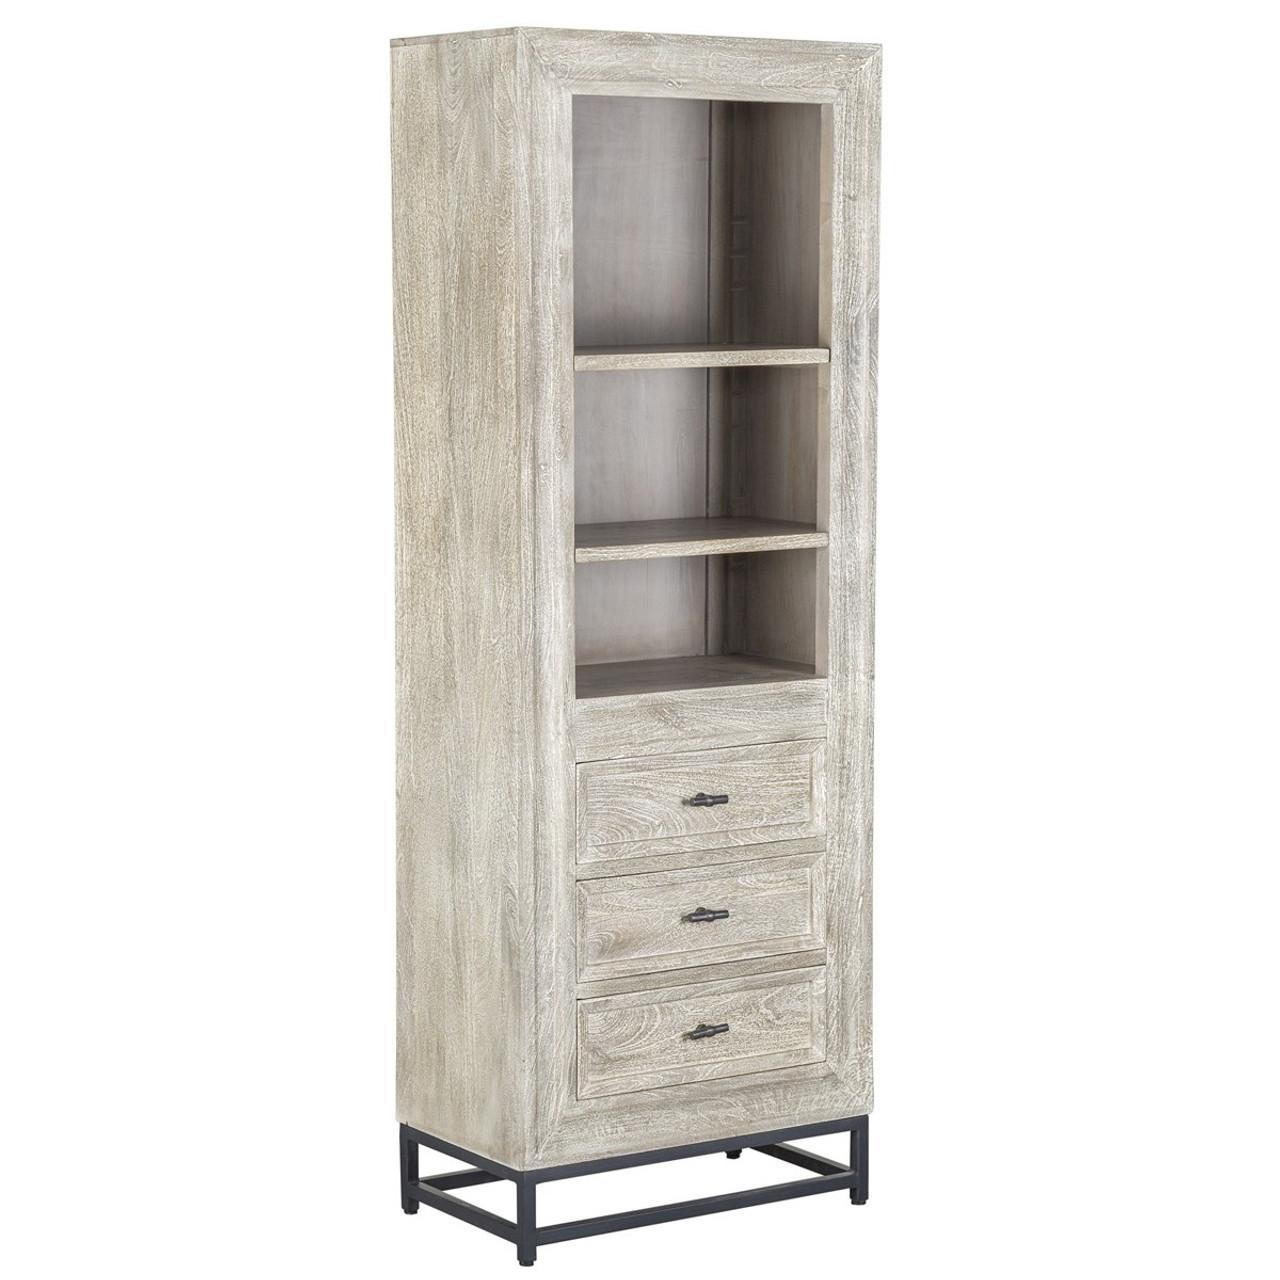 Marabella Solid Wood 3 Drawer Whitewash Bookcase